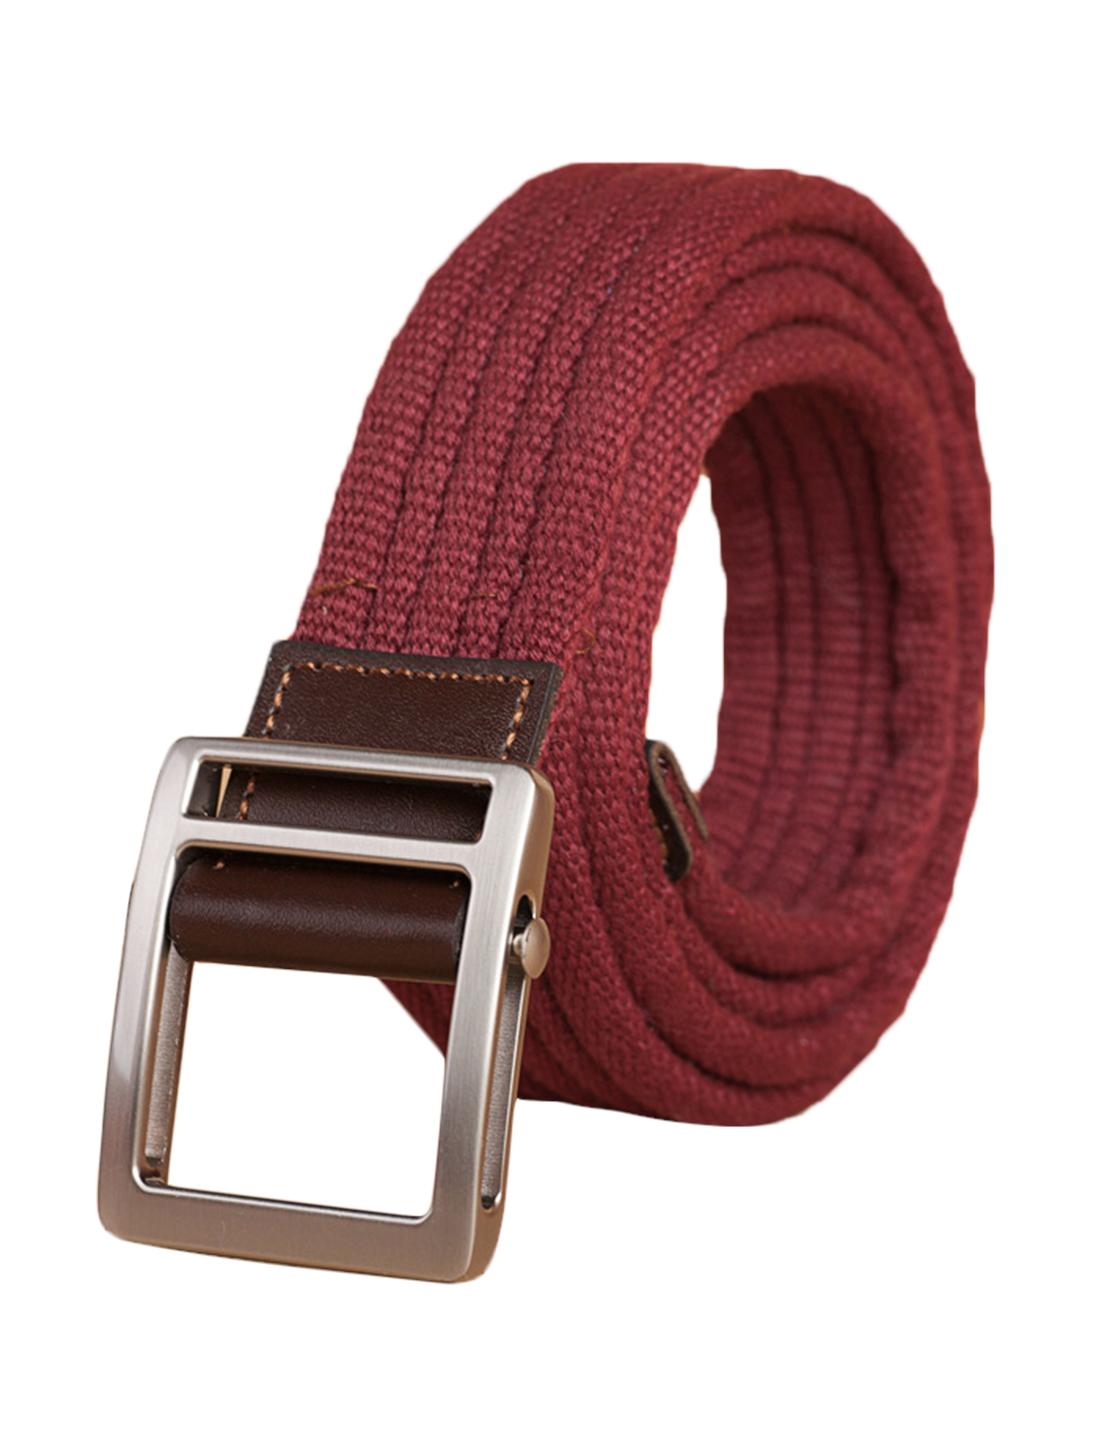 "Unisex Leather Paneled Canvas Slide Buckle Belt Width 1 5/8"" Burgundy"